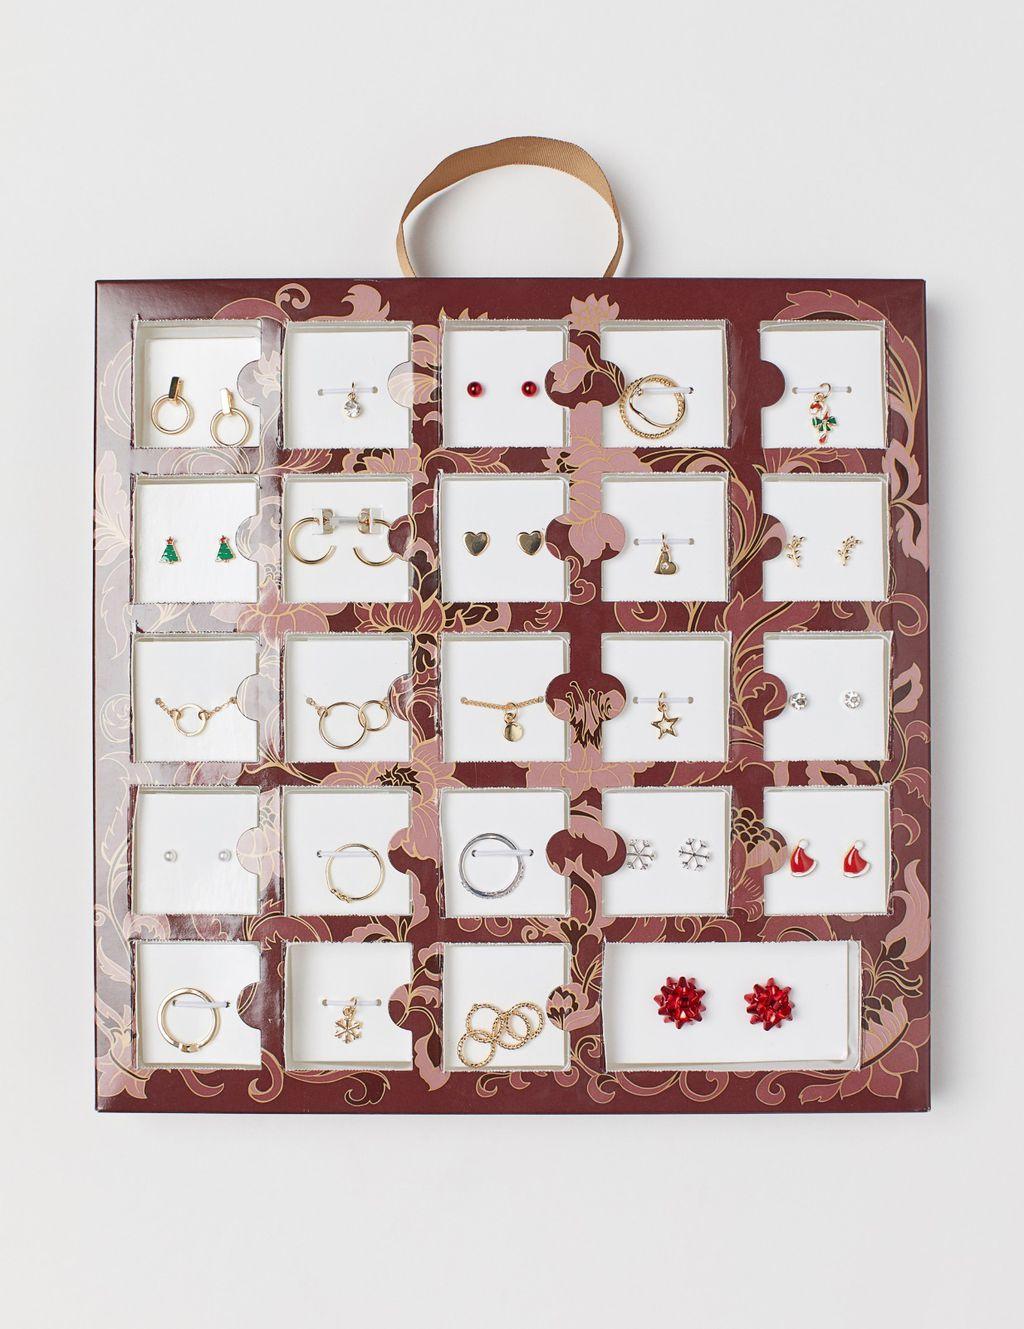 Adventski kalendar iz H&M-a s nakitom - 2